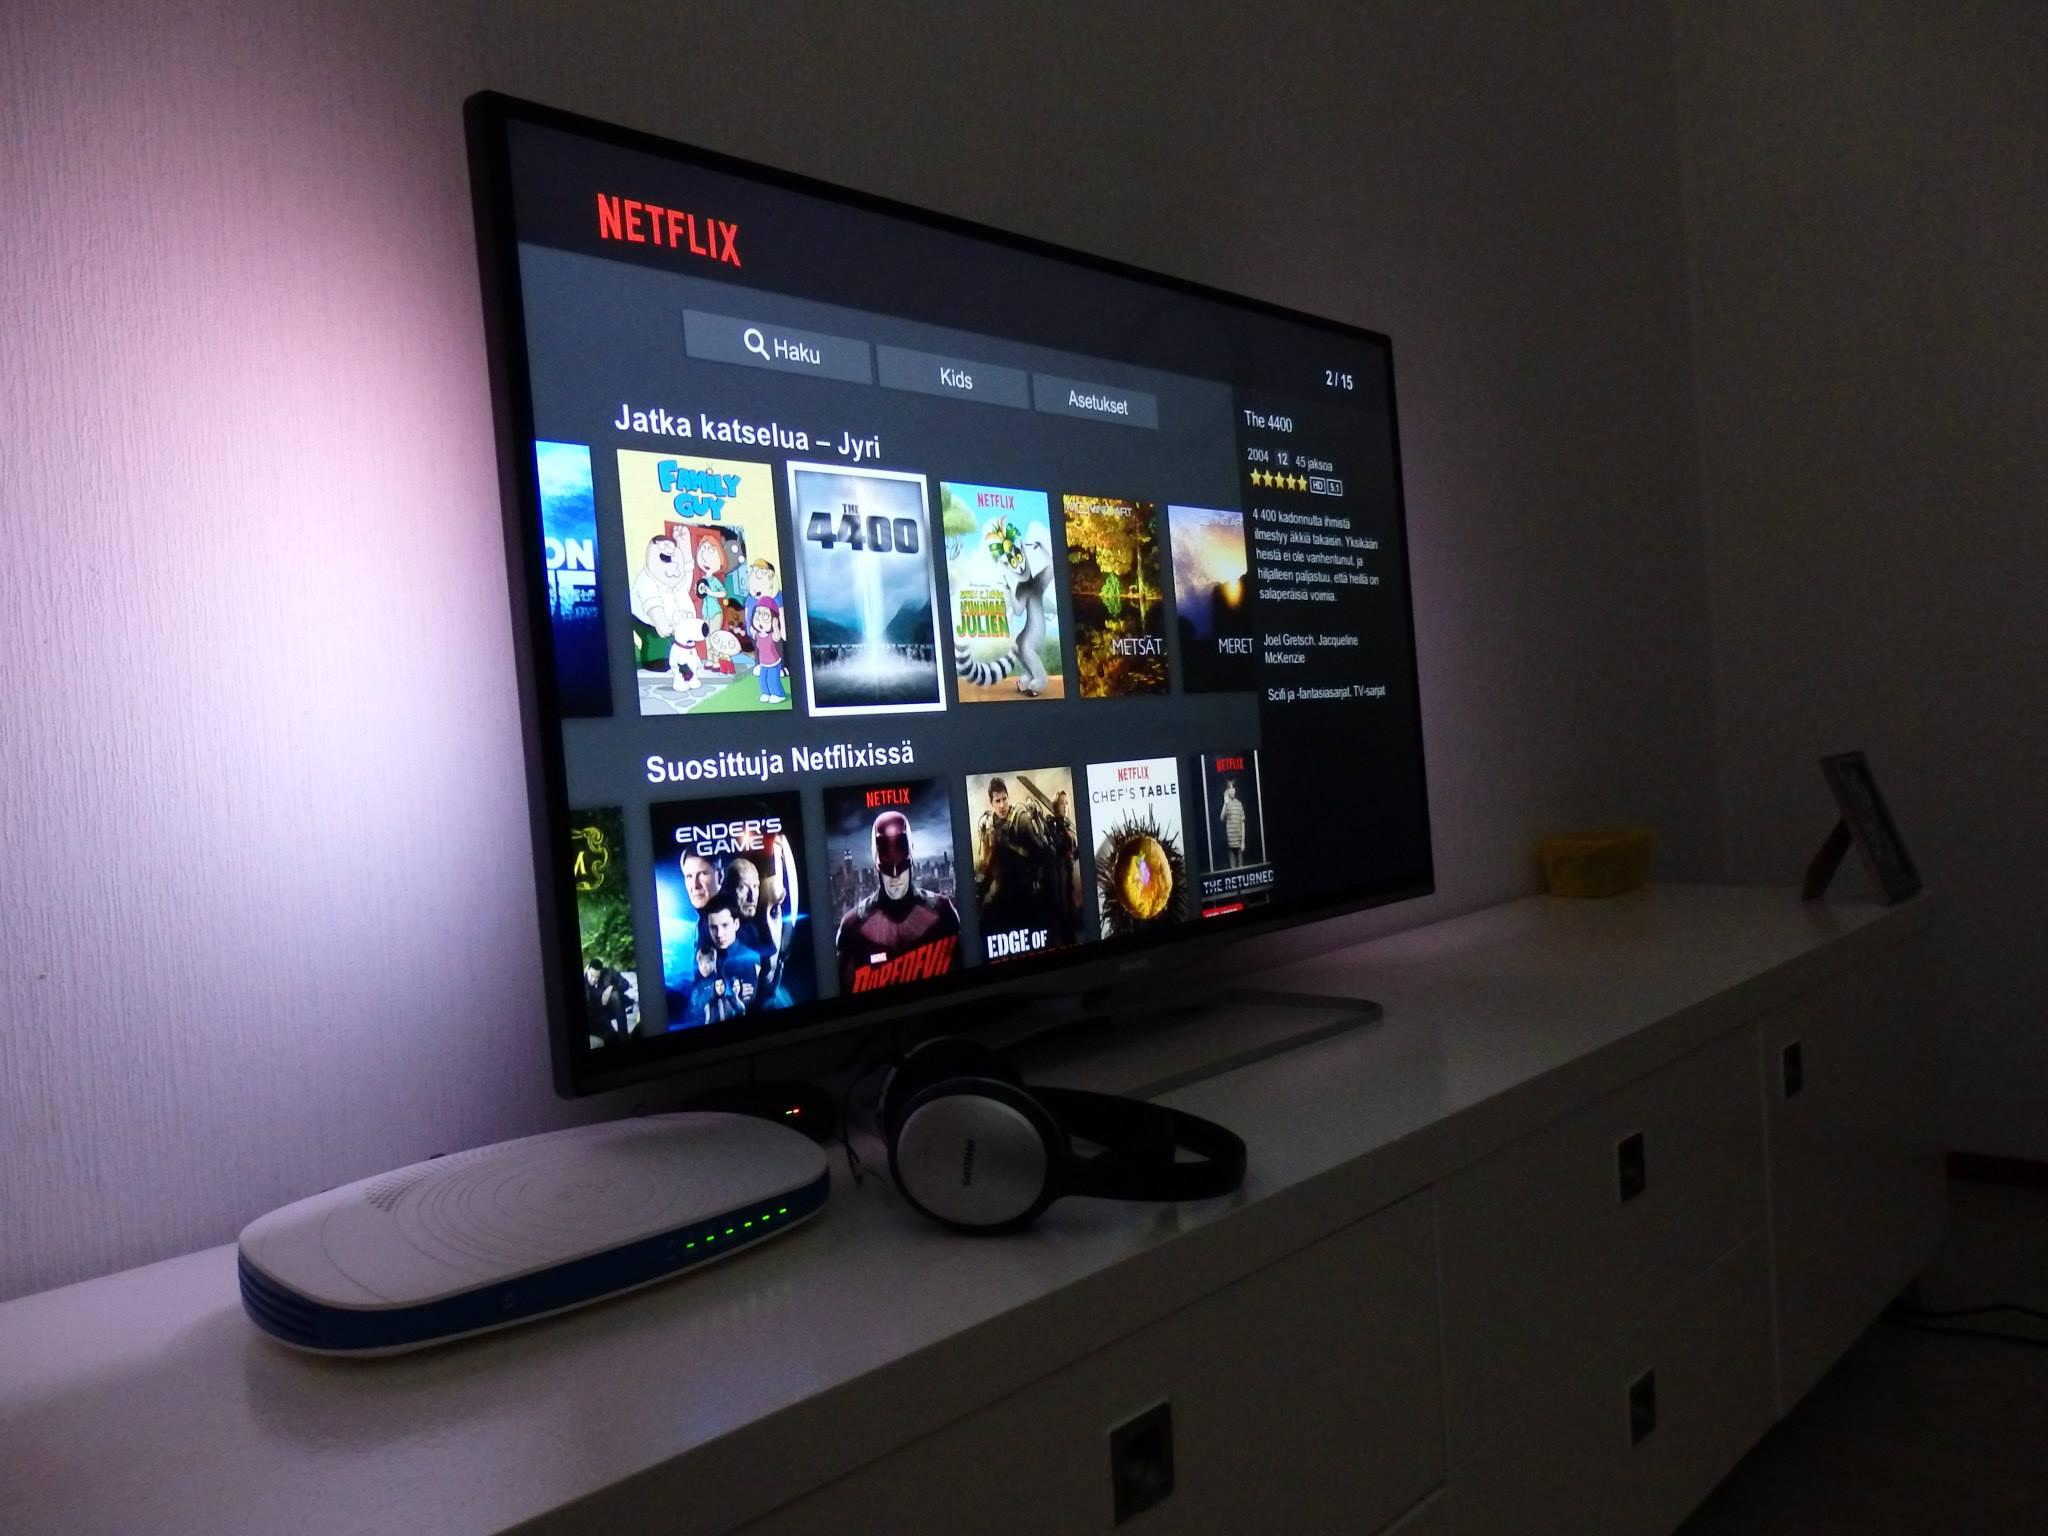 Netflix TV and headphones by Philips